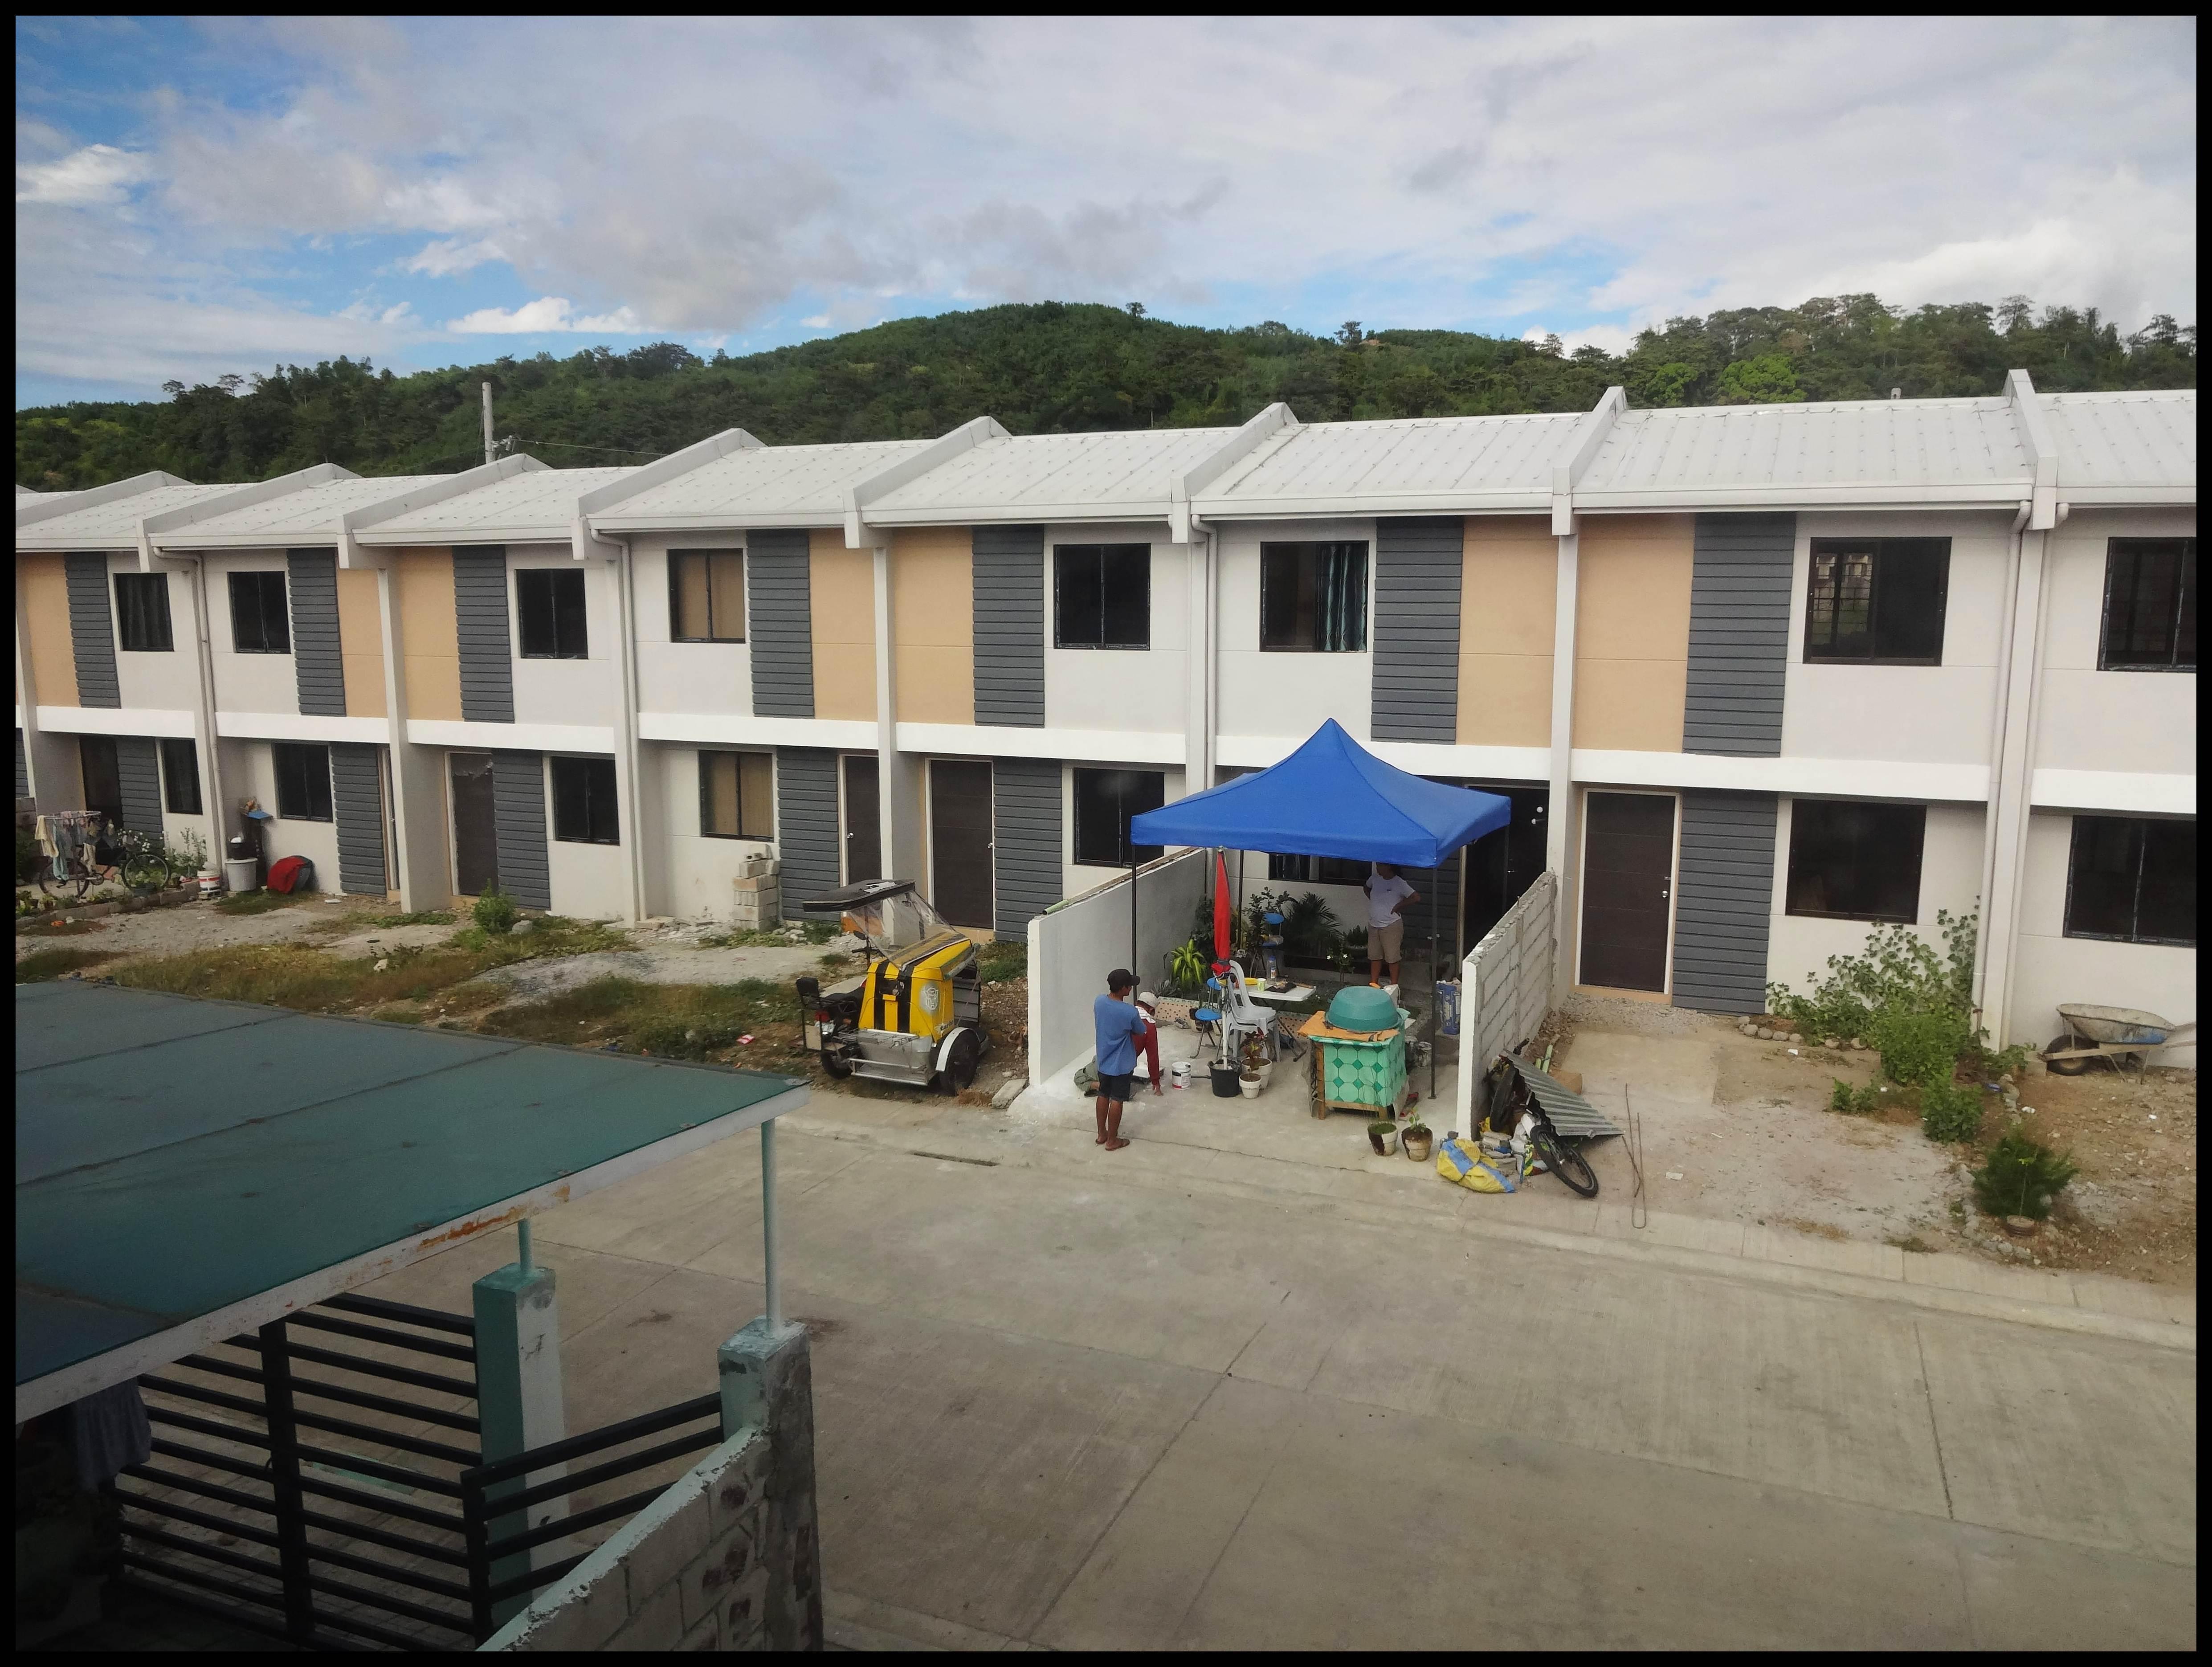 2 storey house and lot for sale in binangonan, rizal thru pag-ibig